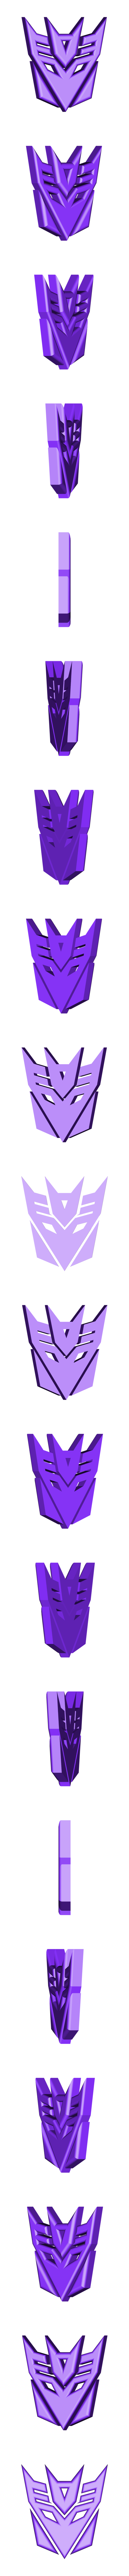 Decepticon.STL Download free STL file Decepticon Transformers LED Nightlight/Lamp • 3D print model, Balkhagal4D